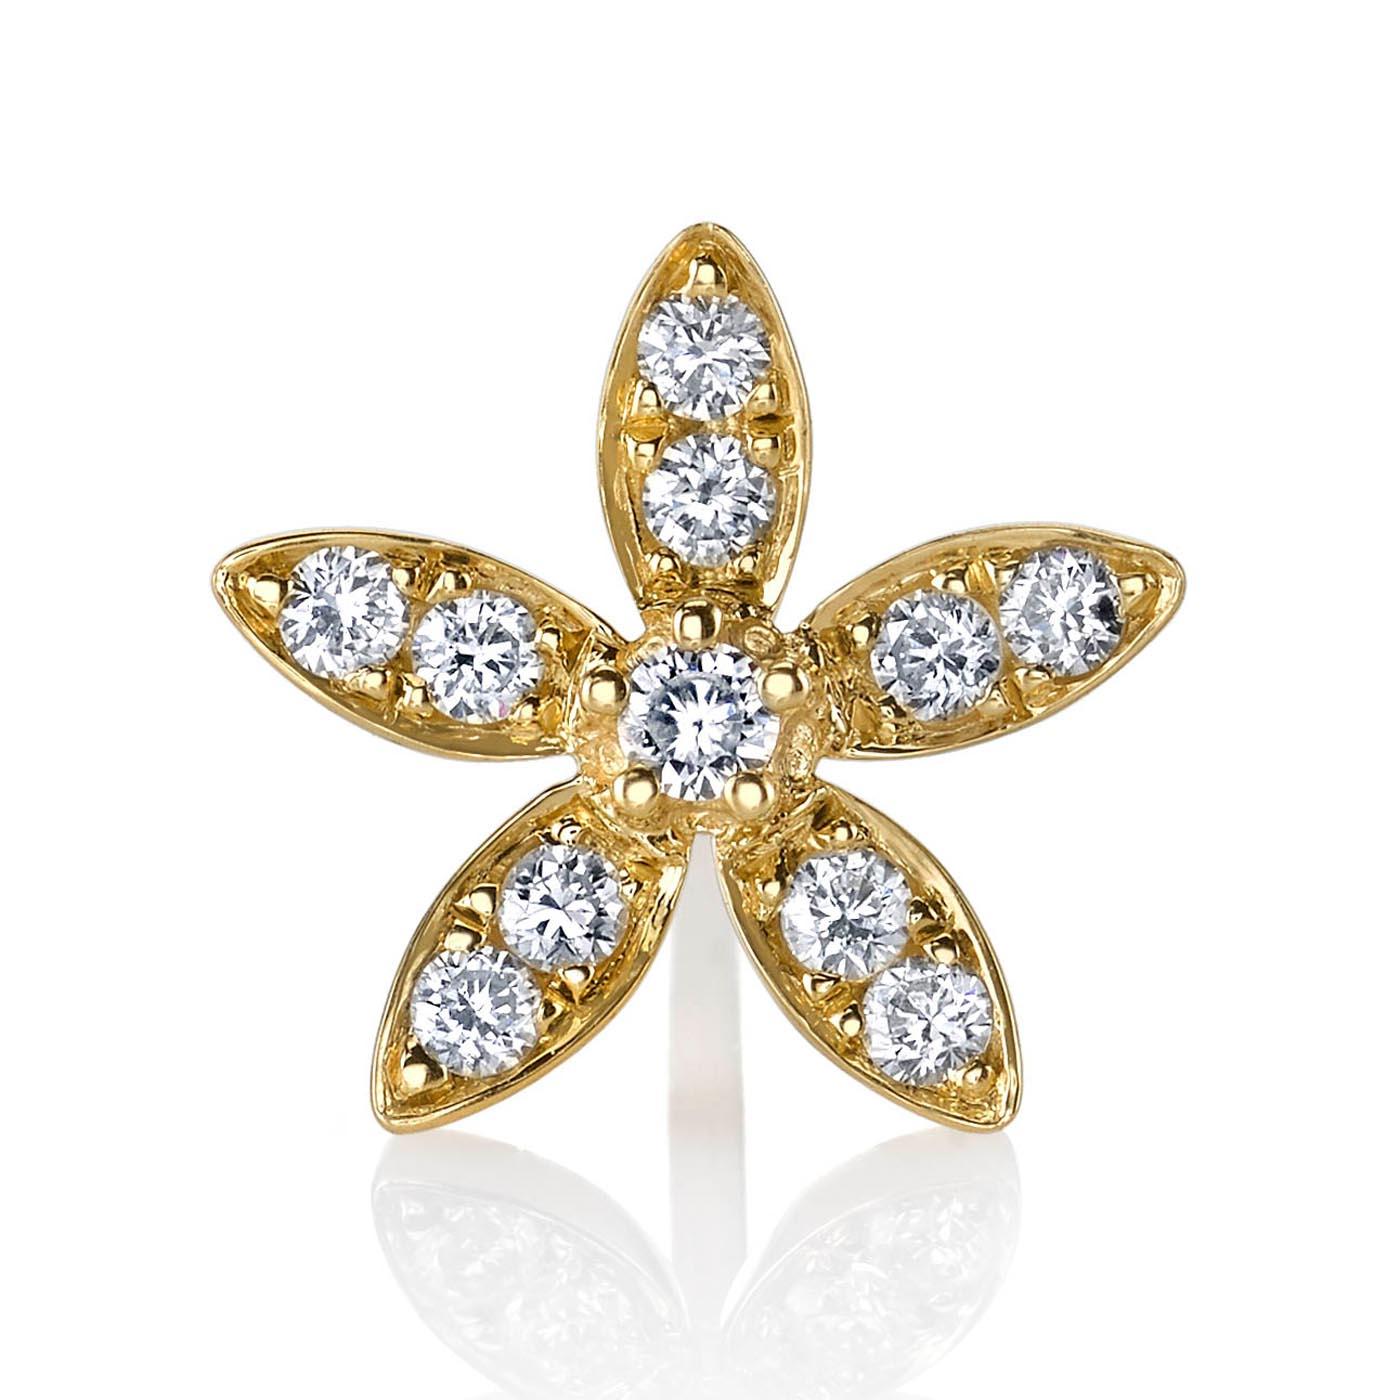 Diamond Earrings - Studs Style #: MARS-26784